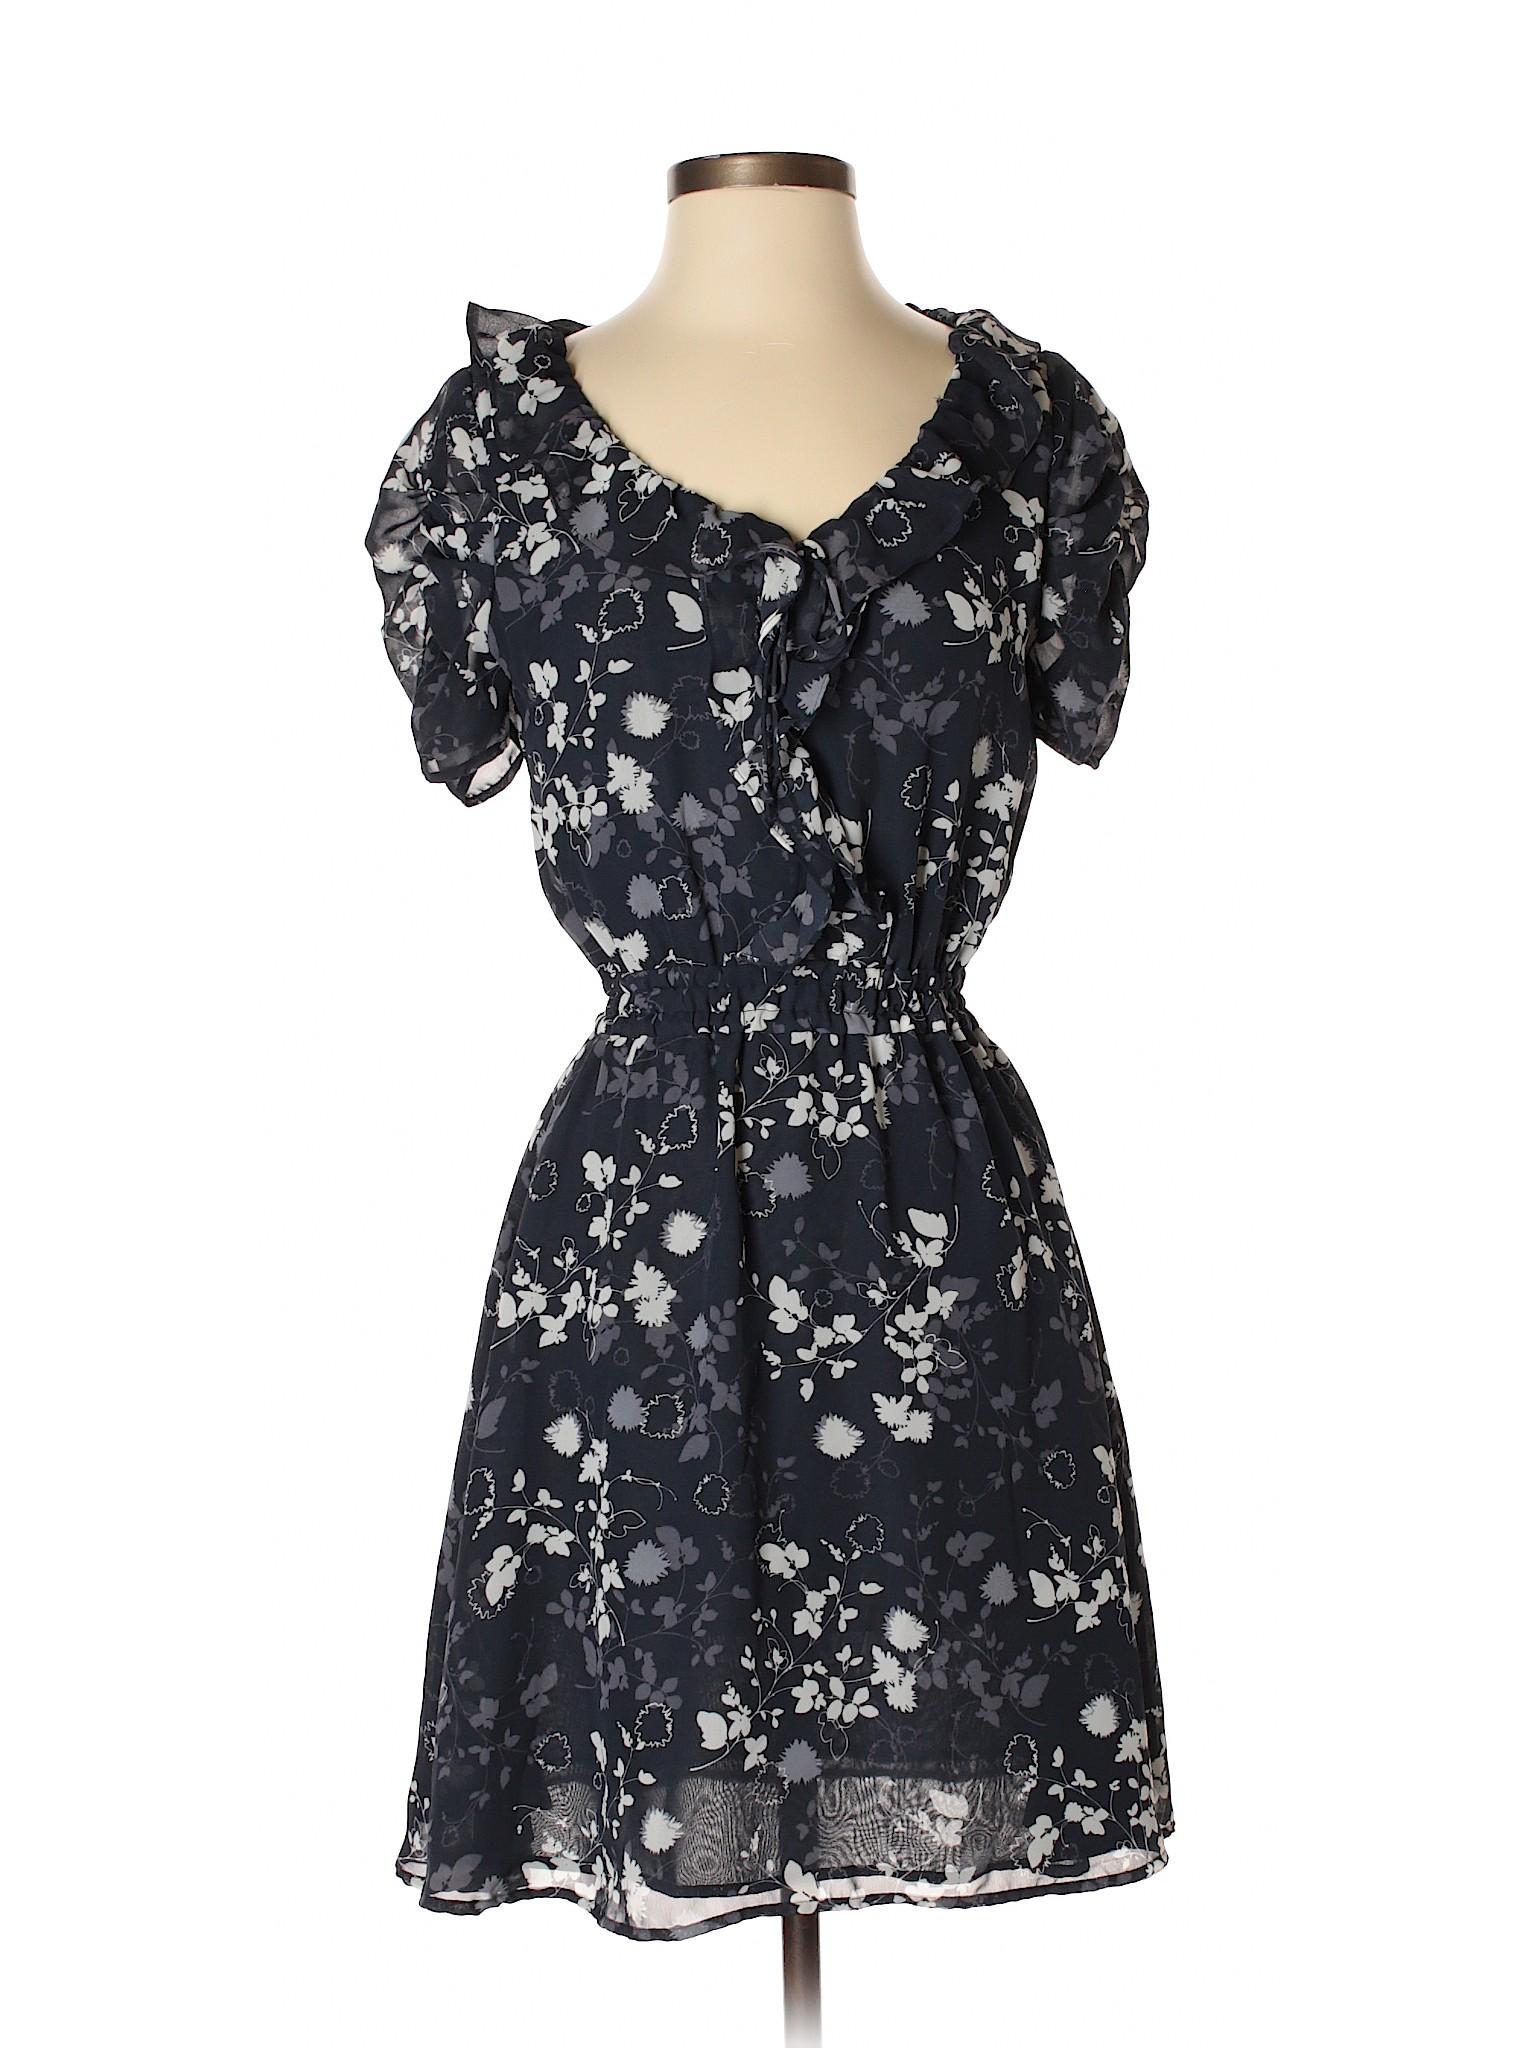 winter Dress Dress Gap Boutique Casual Boutique winter Casual Gap xzqXgUgw8